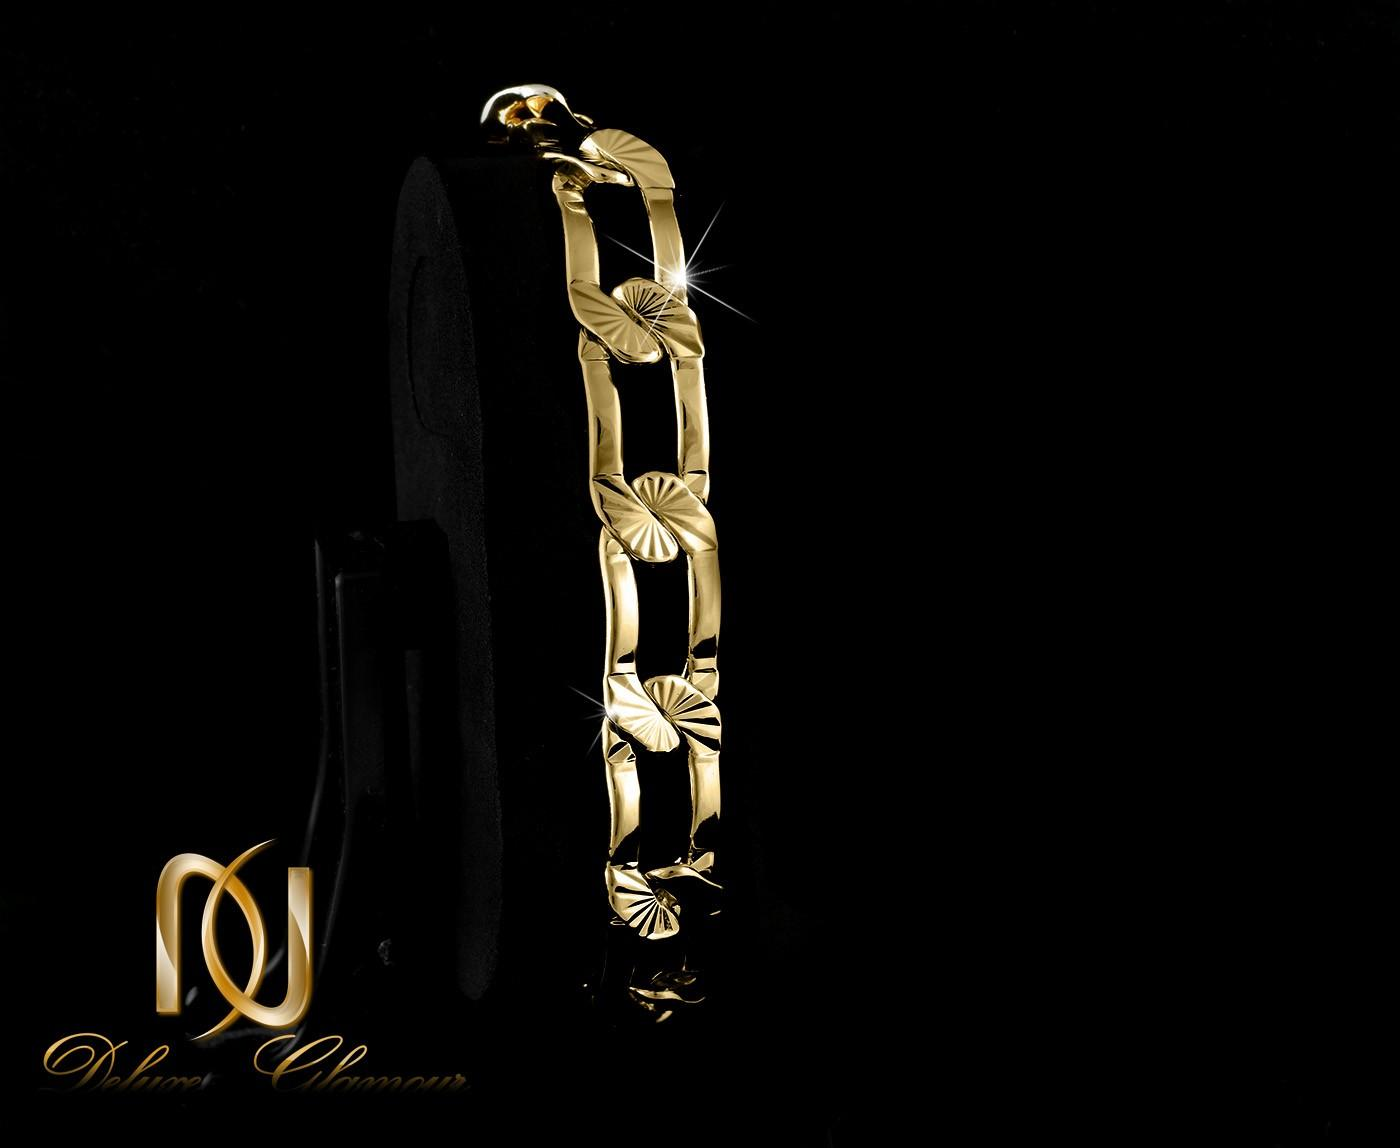 دستبند زنانه ژوپينگ طرح طلاي كارتيه DS-N260 از نماي مشكي